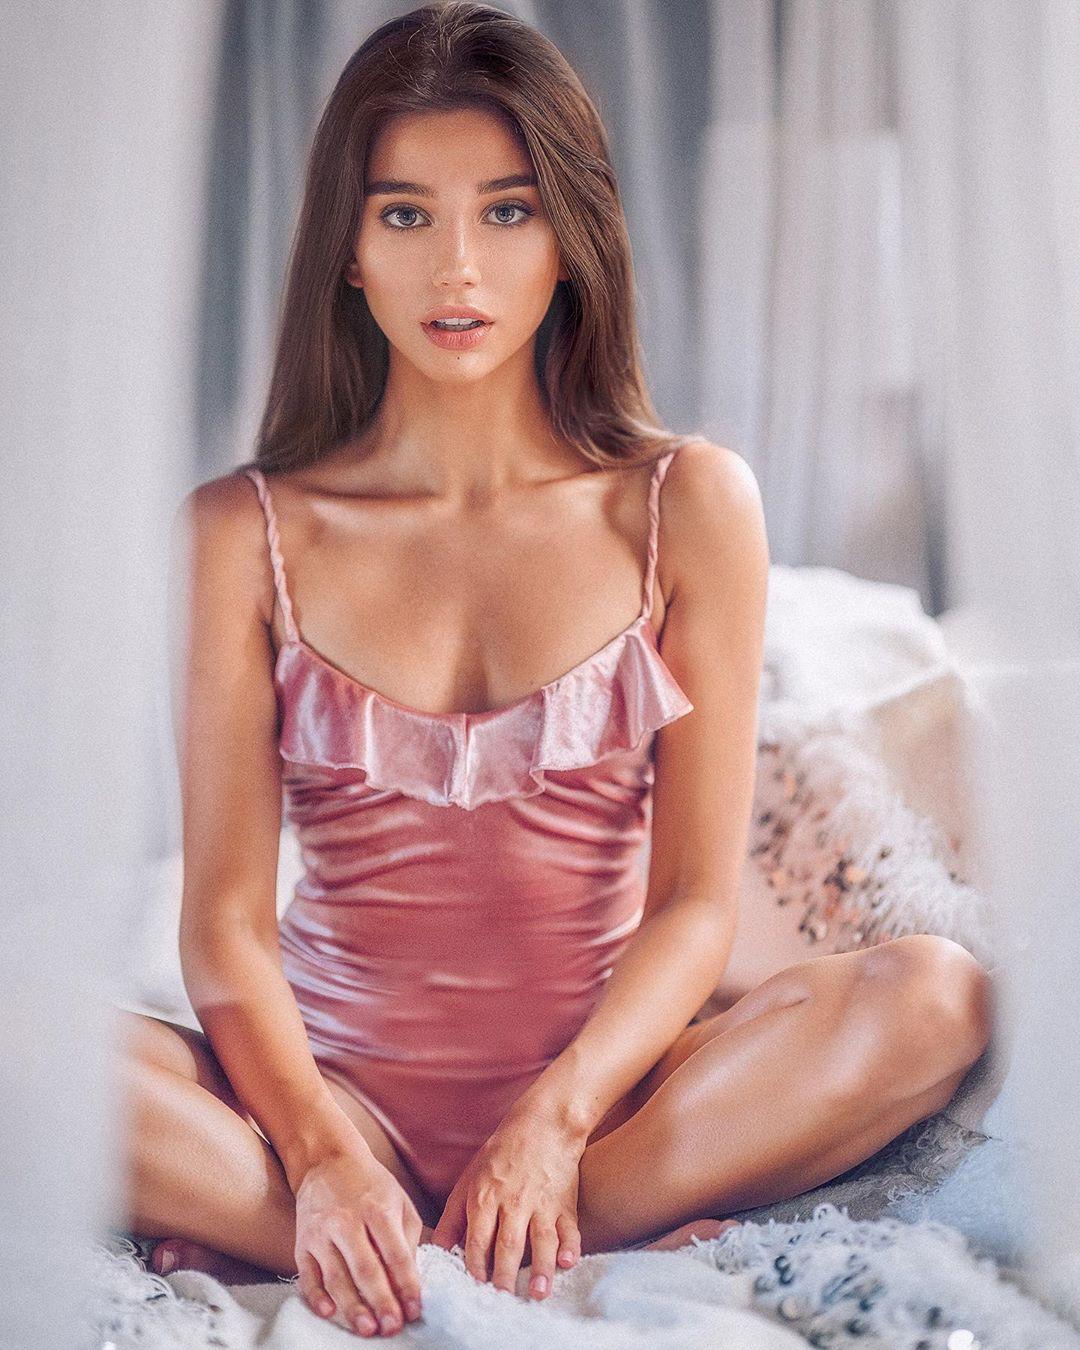 pink hot instagram model, hot lingerie photo, instagram photoshoot